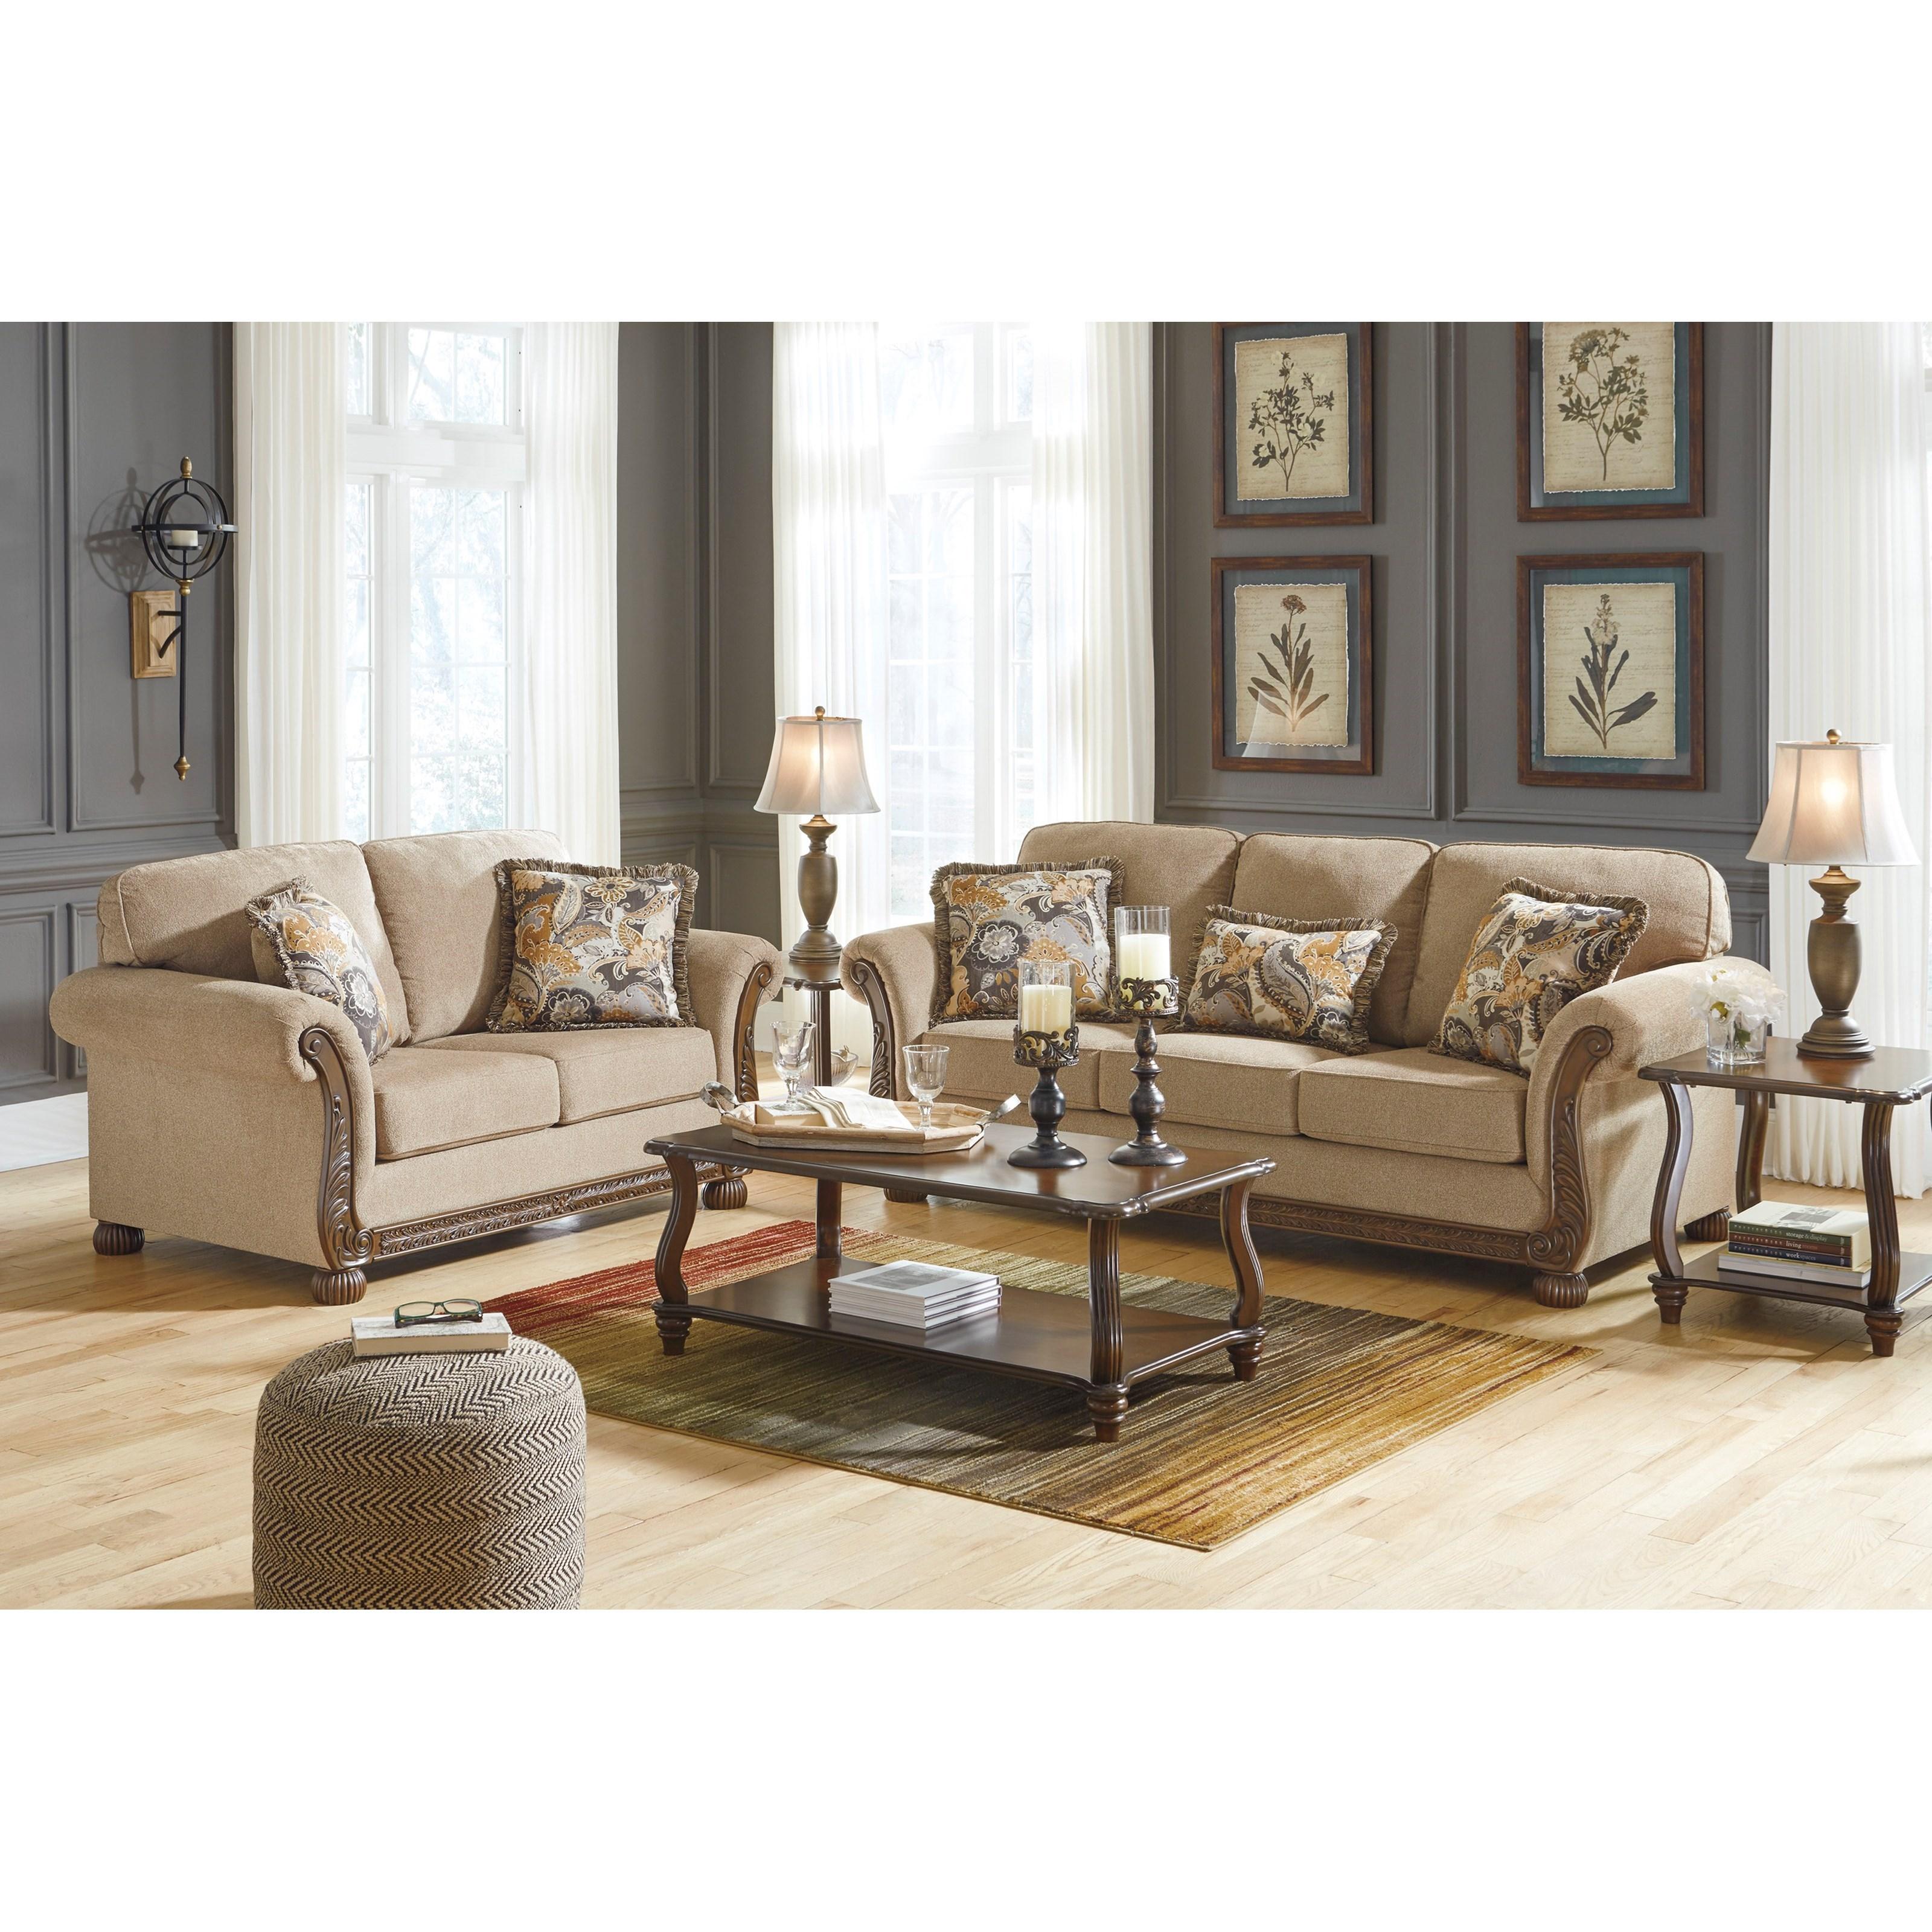 Signature Design By Ashley Living Room Jarreau Chair: Signature Design By Ashley Westerwood Stationary Living